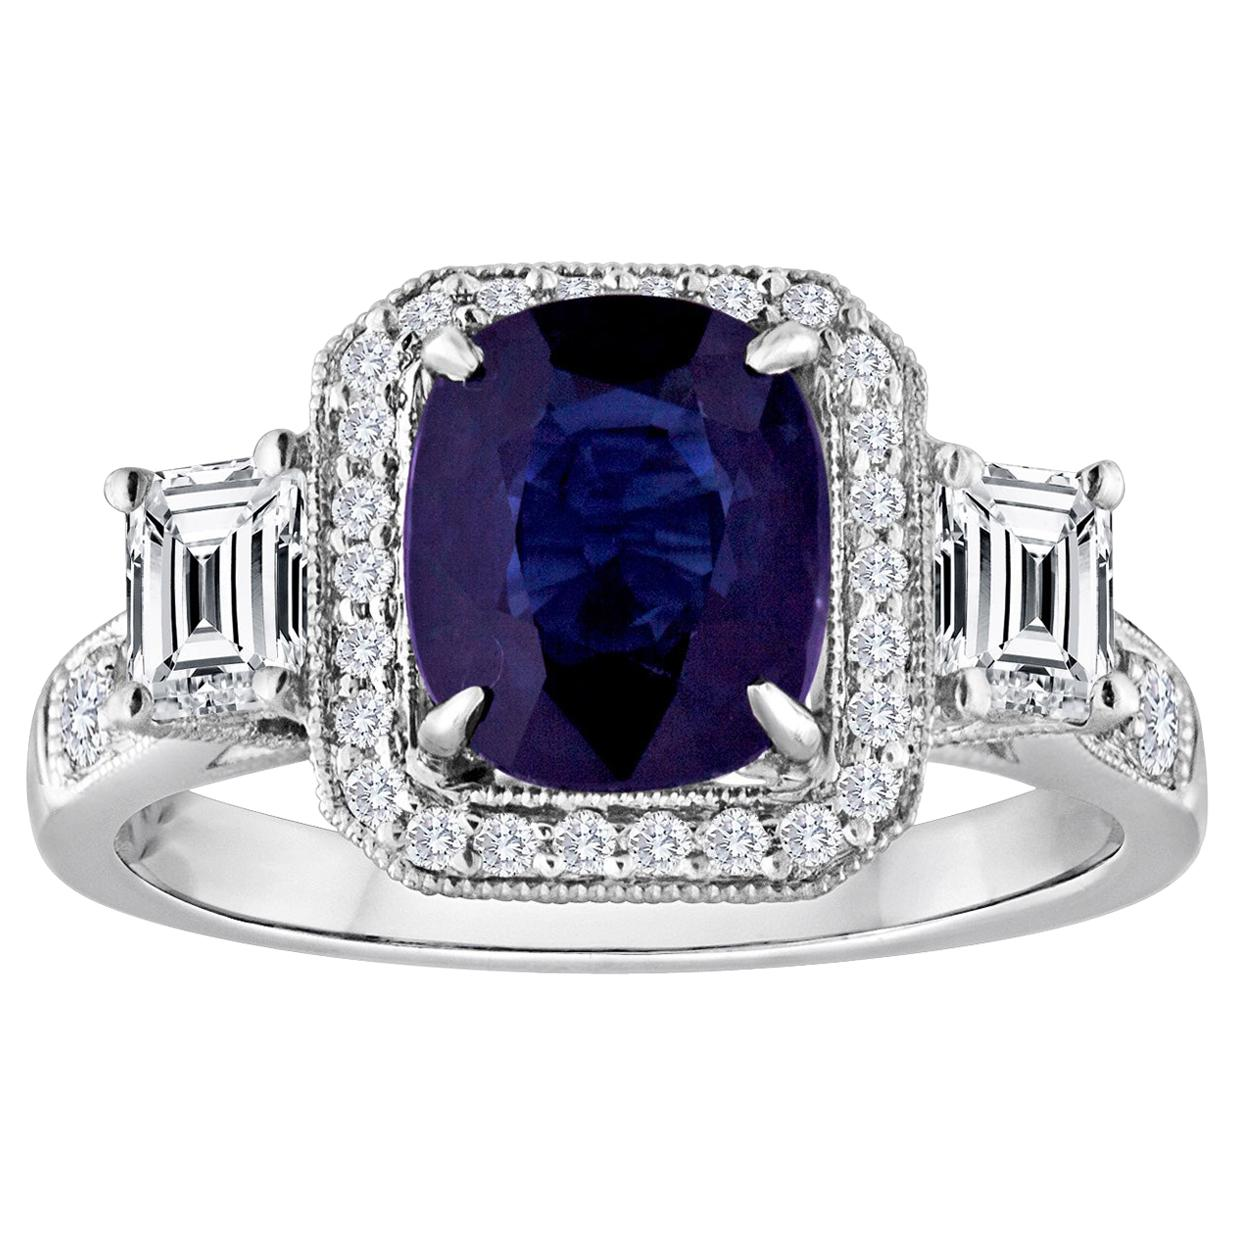 Certified 2.16 Carat No Heat Oval Blue Sapphire Diamond Gold Milgrain Ring